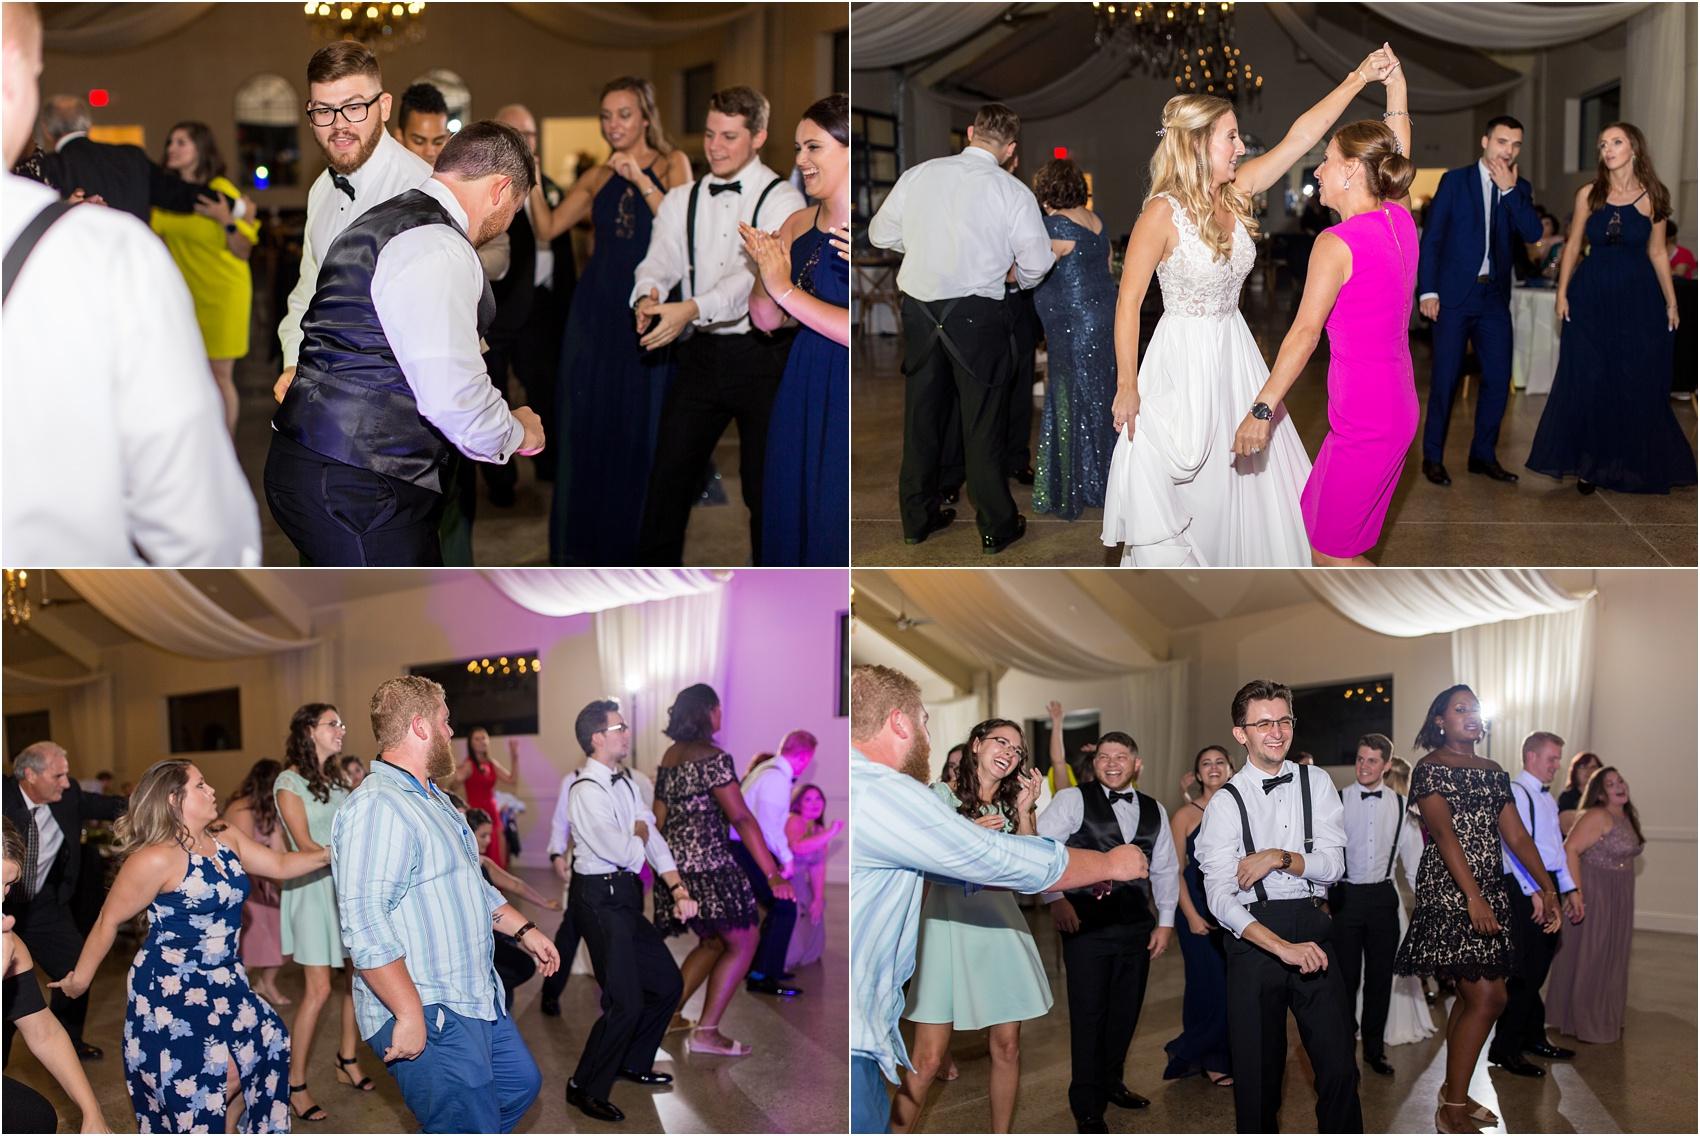 Savannah Eve Photography- Jurek-Woodworth Wedding- Sneak Peek-101.jpg